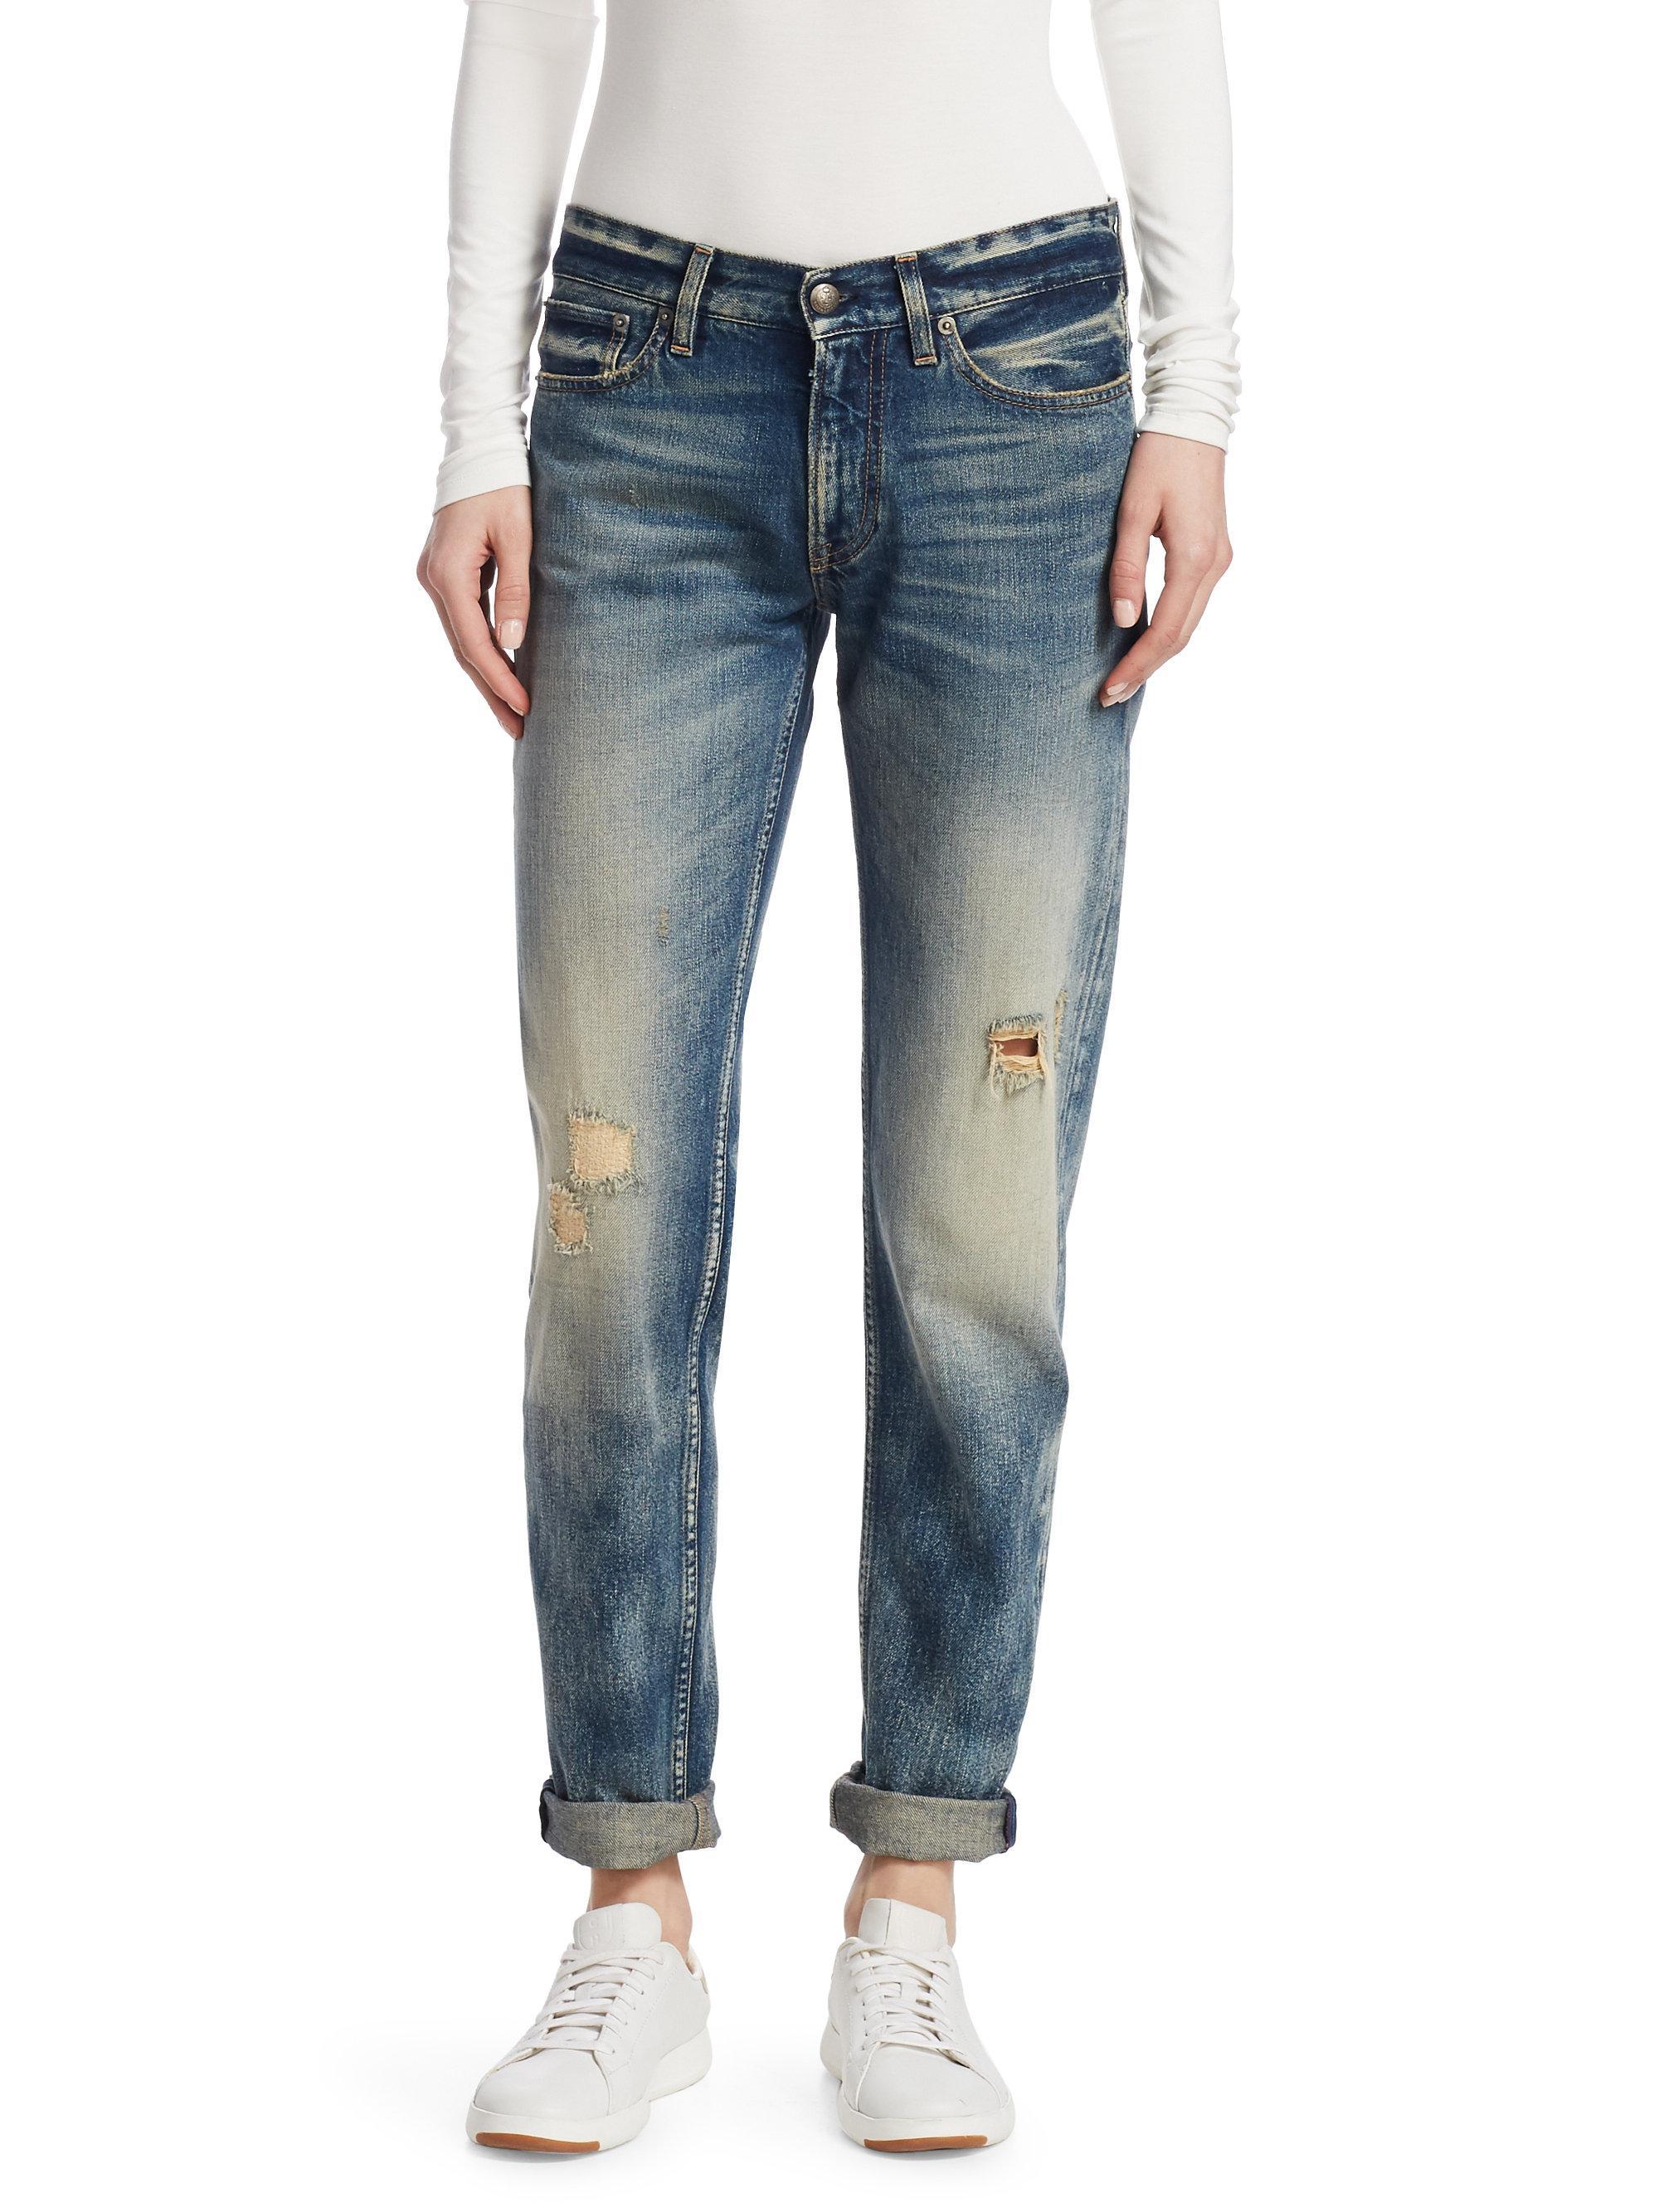 Ralph Lauren Collection. Women's Blue Iconic Style 320 Distressed Boyfriend  Jeans